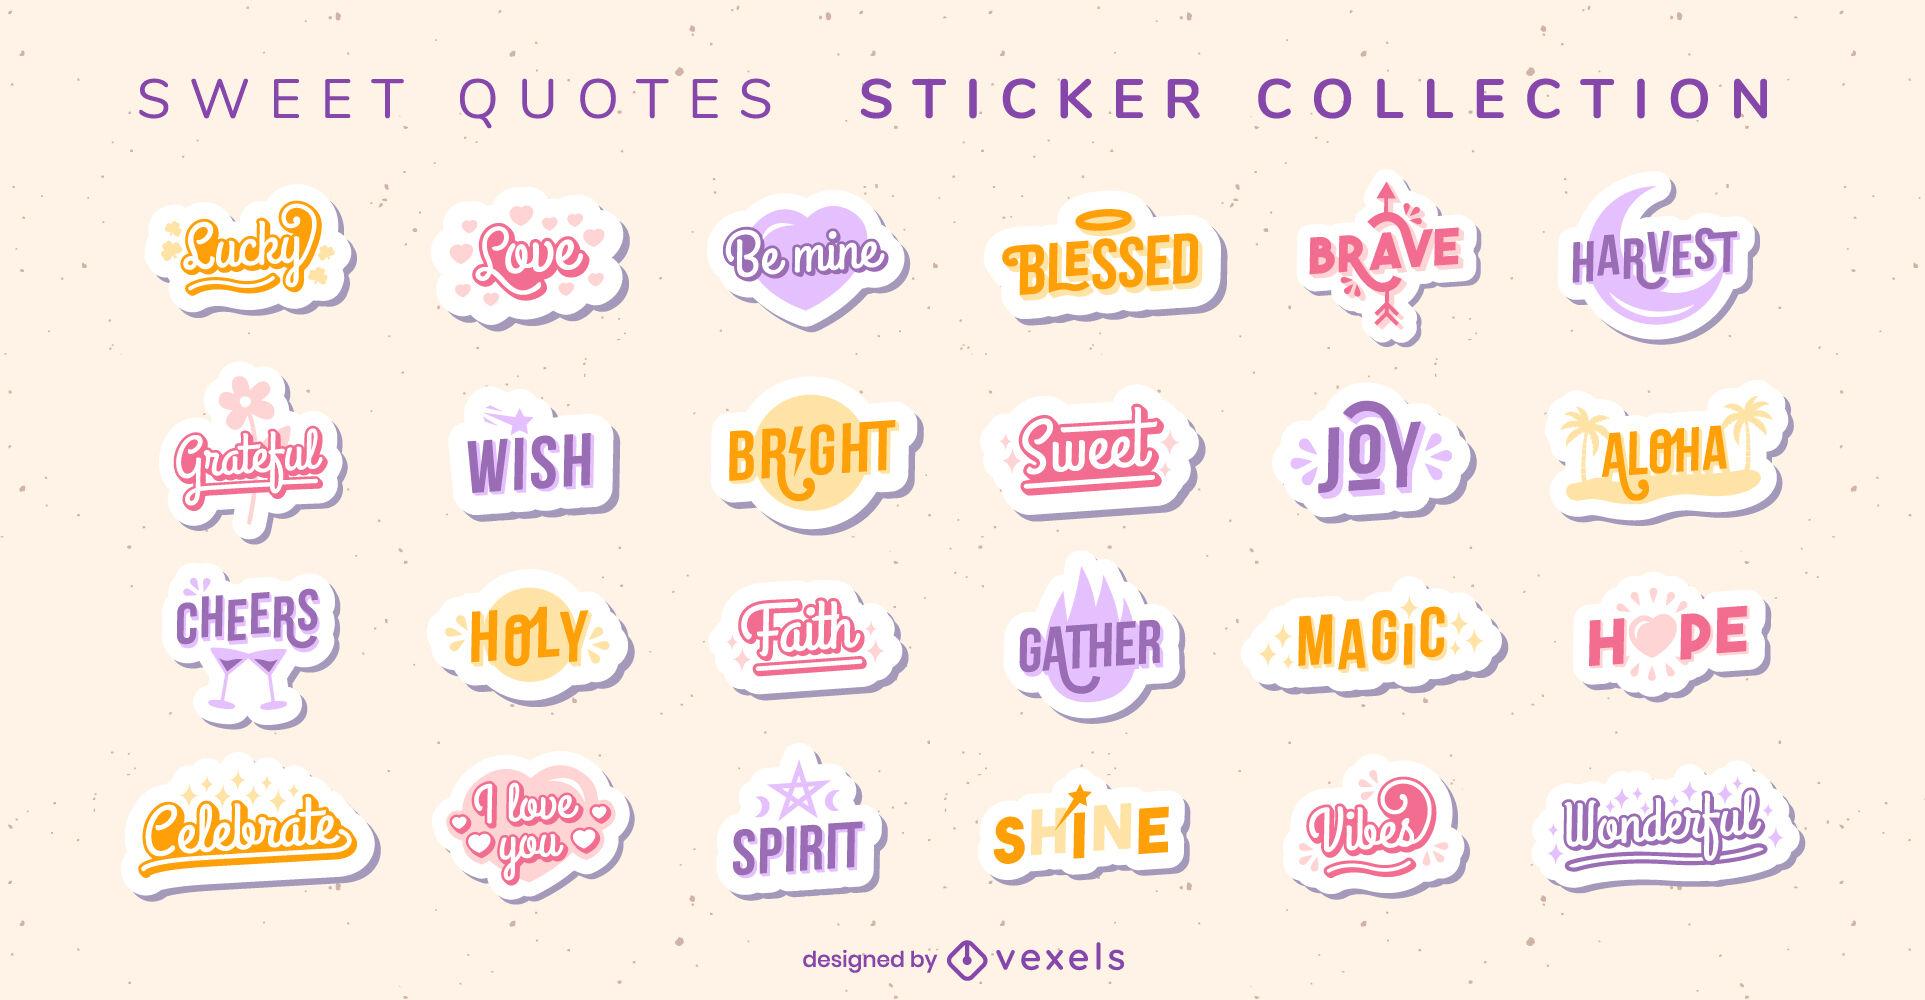 Kind quotes assortment sticker set